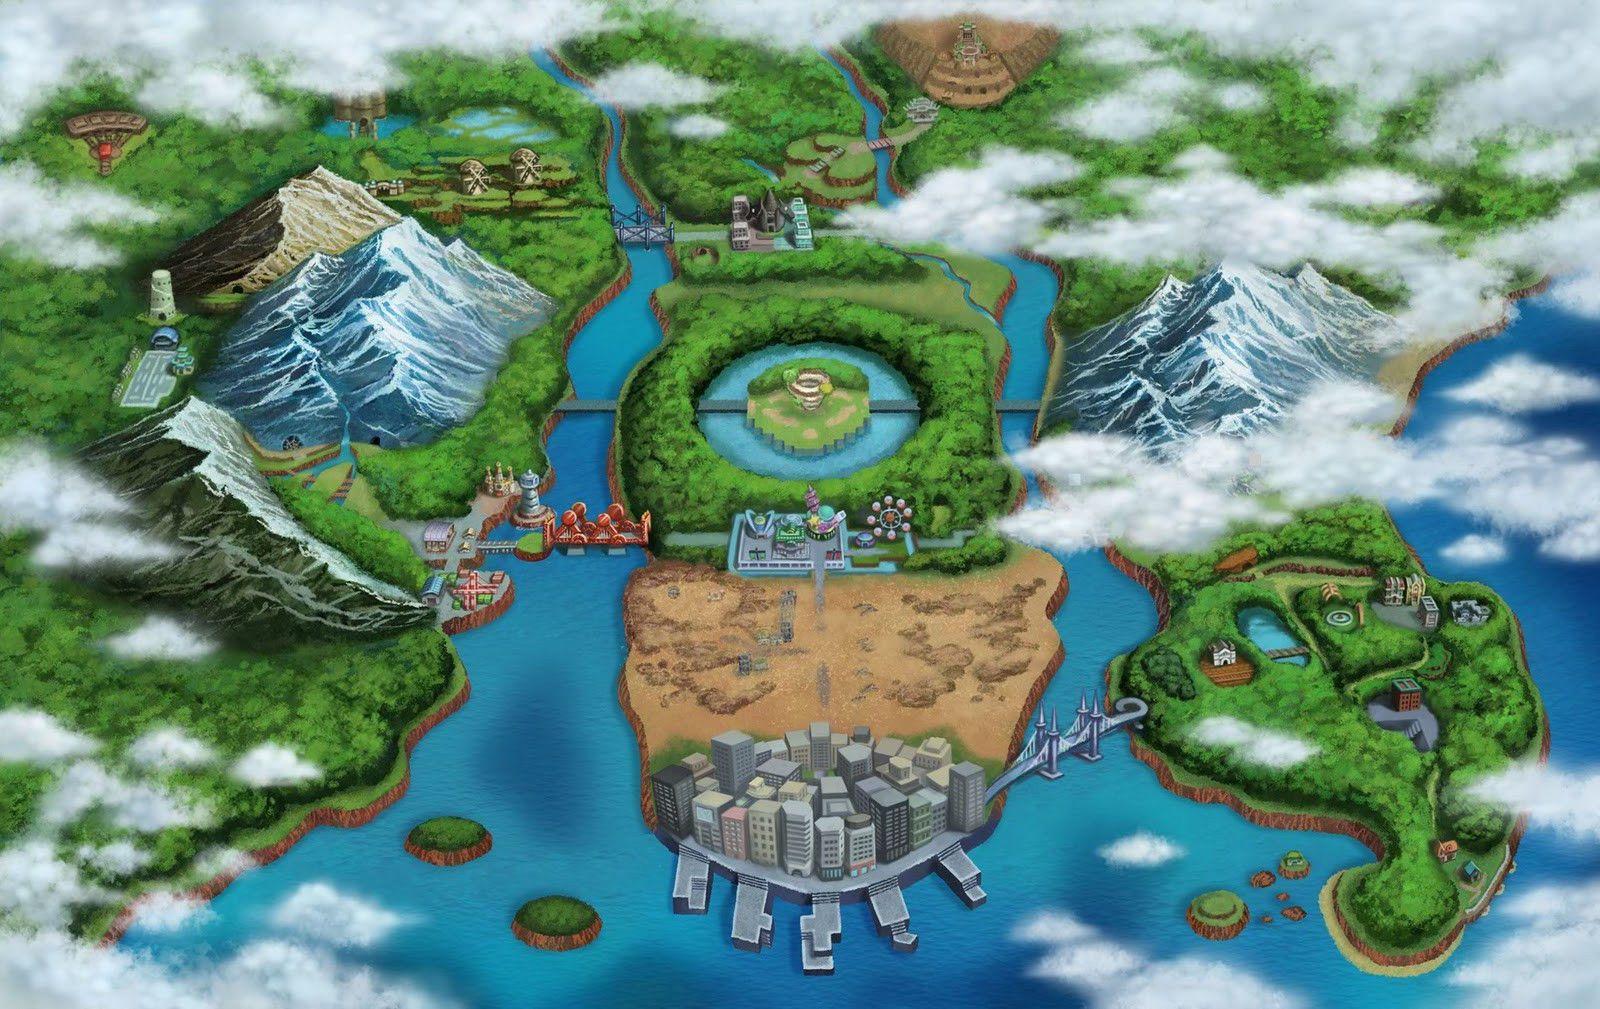 $14.4 - Pokémon Black And White World Map - Poster Huge 34 ... on pokemon world map and locations, pokemon white version map, minecraft pokemon soul silver map, pokemon crystal map, pokemon soul silver rom, all pokemon regions world map, pokemon unova map, pokemon black route 10, pokemon xy, pokemon kalos region, pokemon town map, pokemon mount moon map, pokemon kanto map, pokemon gold map, pokemon laverre city gym map, pokemon y trailer, pokemon black map, pokemon diamond, pokemon y pokemon, pokemon pearl map,